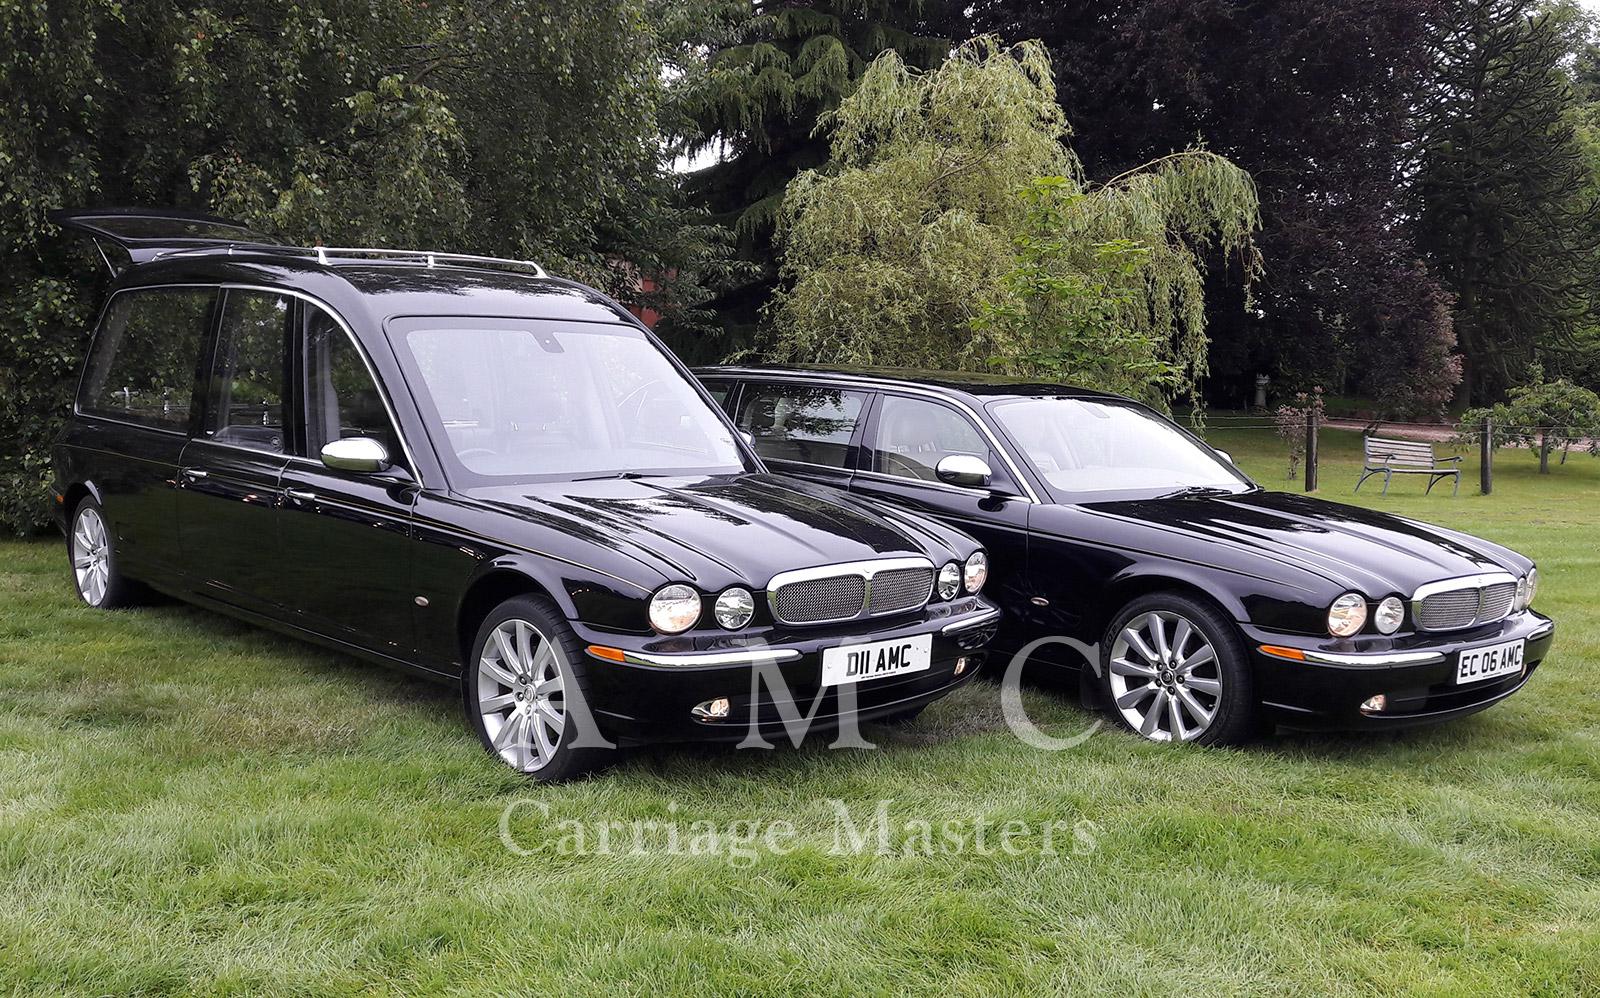 Black Jaguar XJ X350 Model Hearse